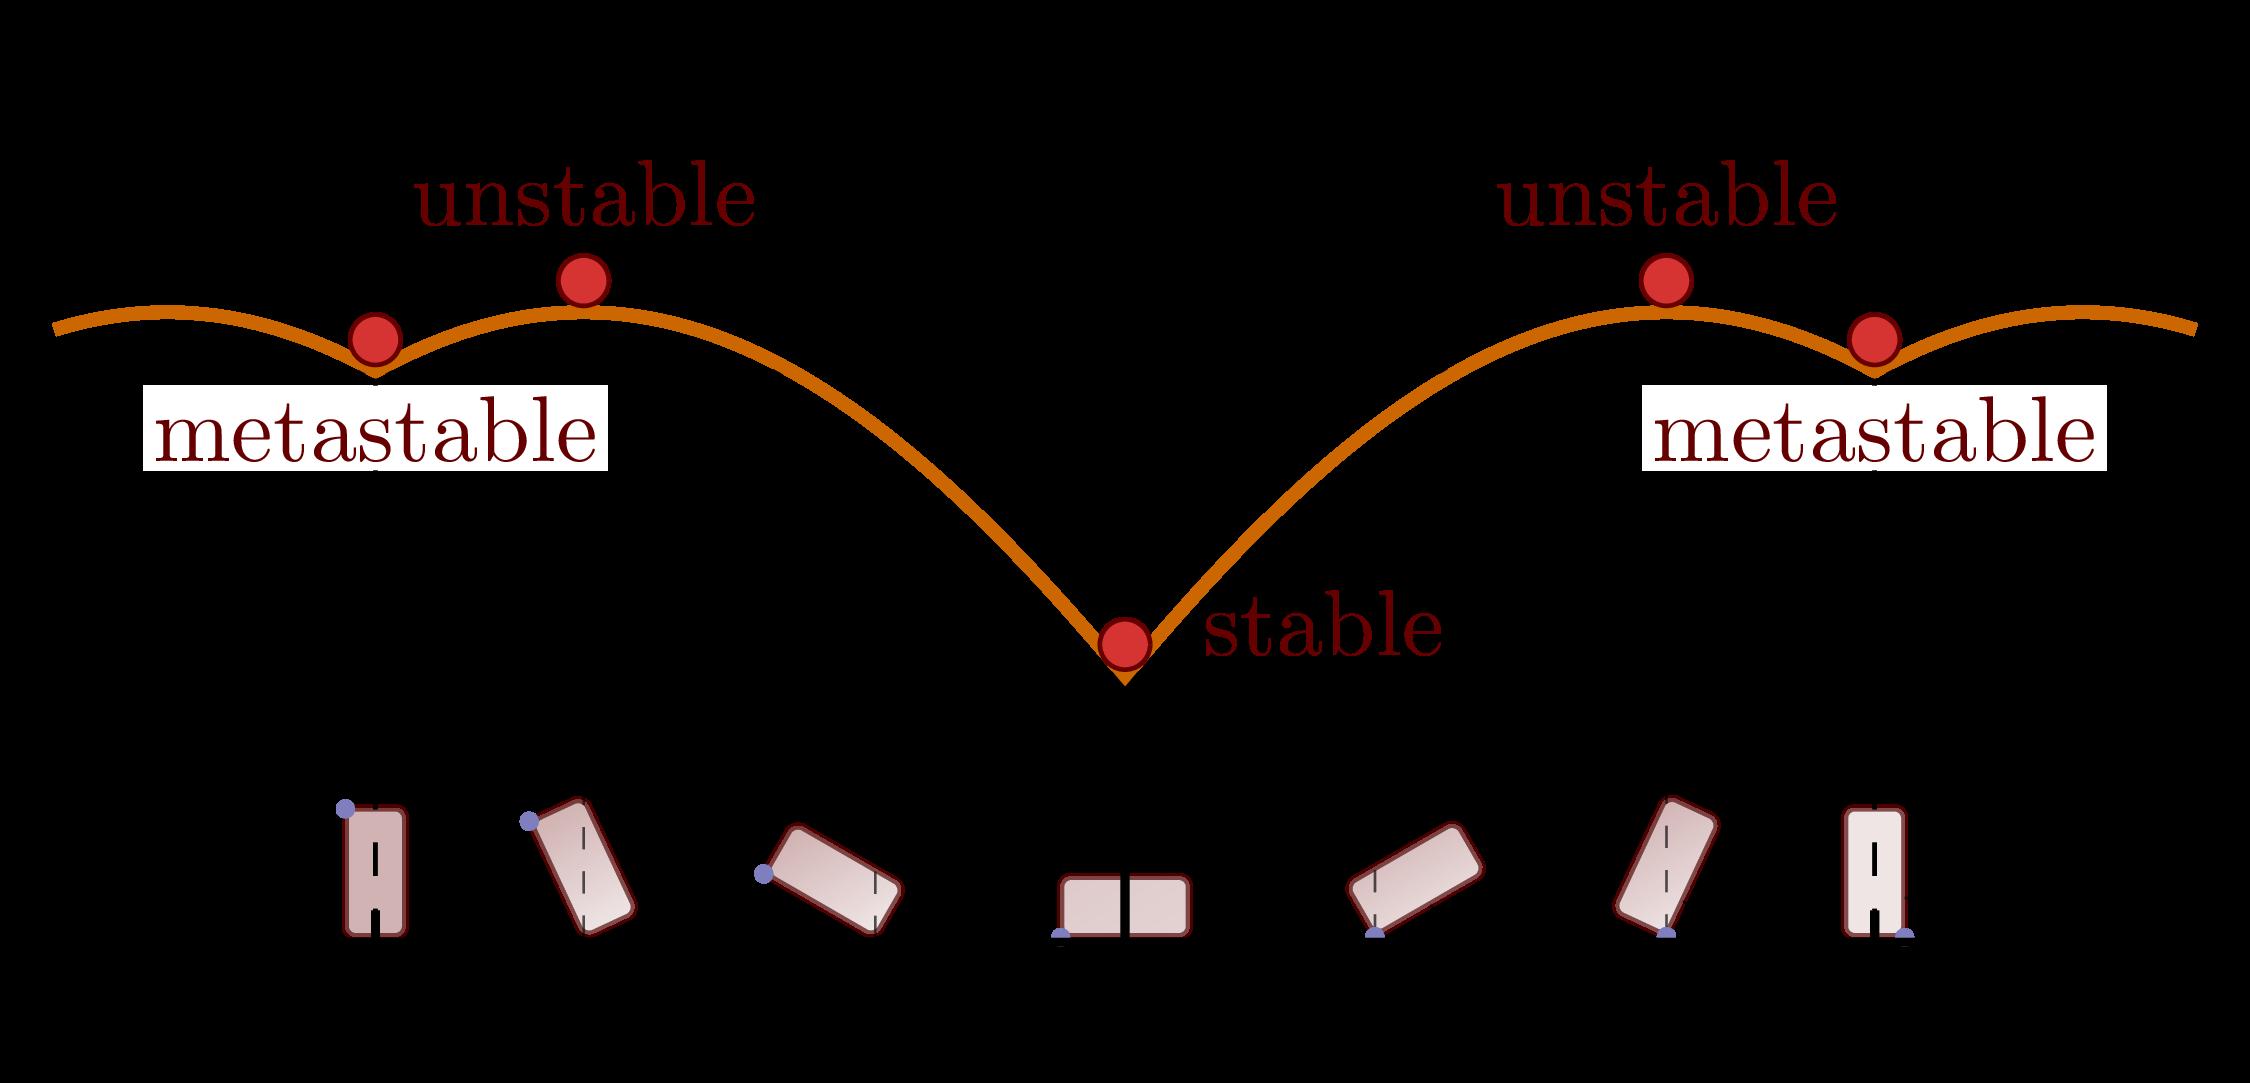 dynamics_stability_block-005.png